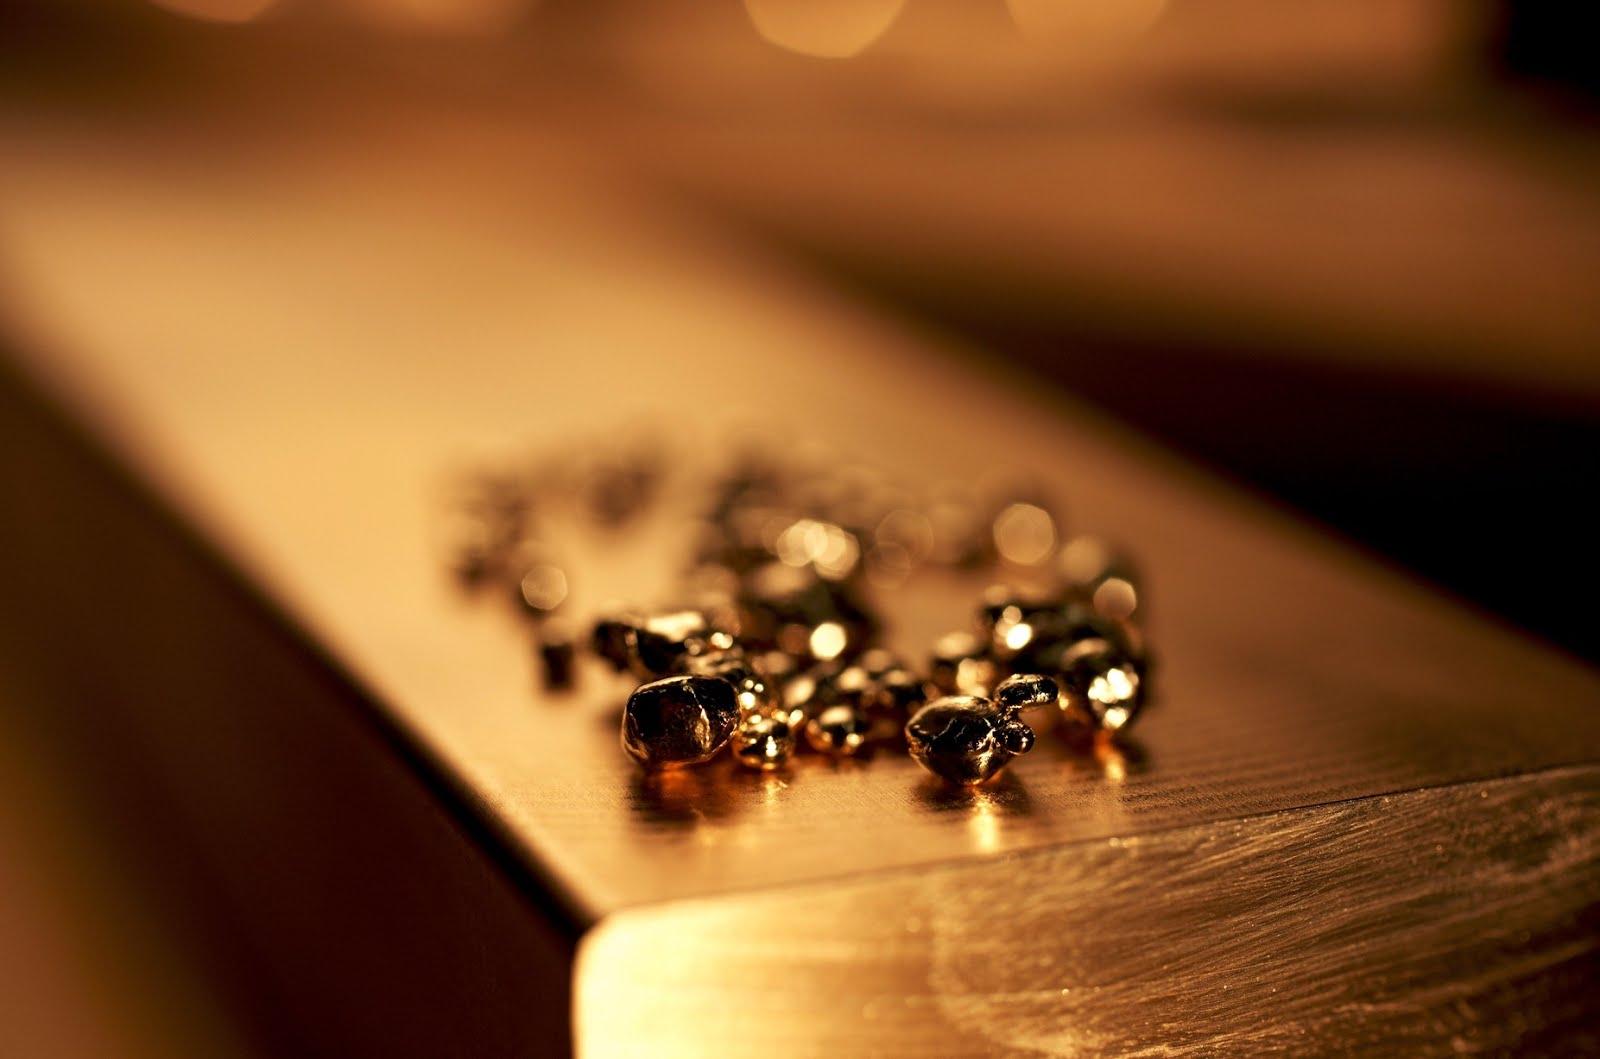 Rolex foundry